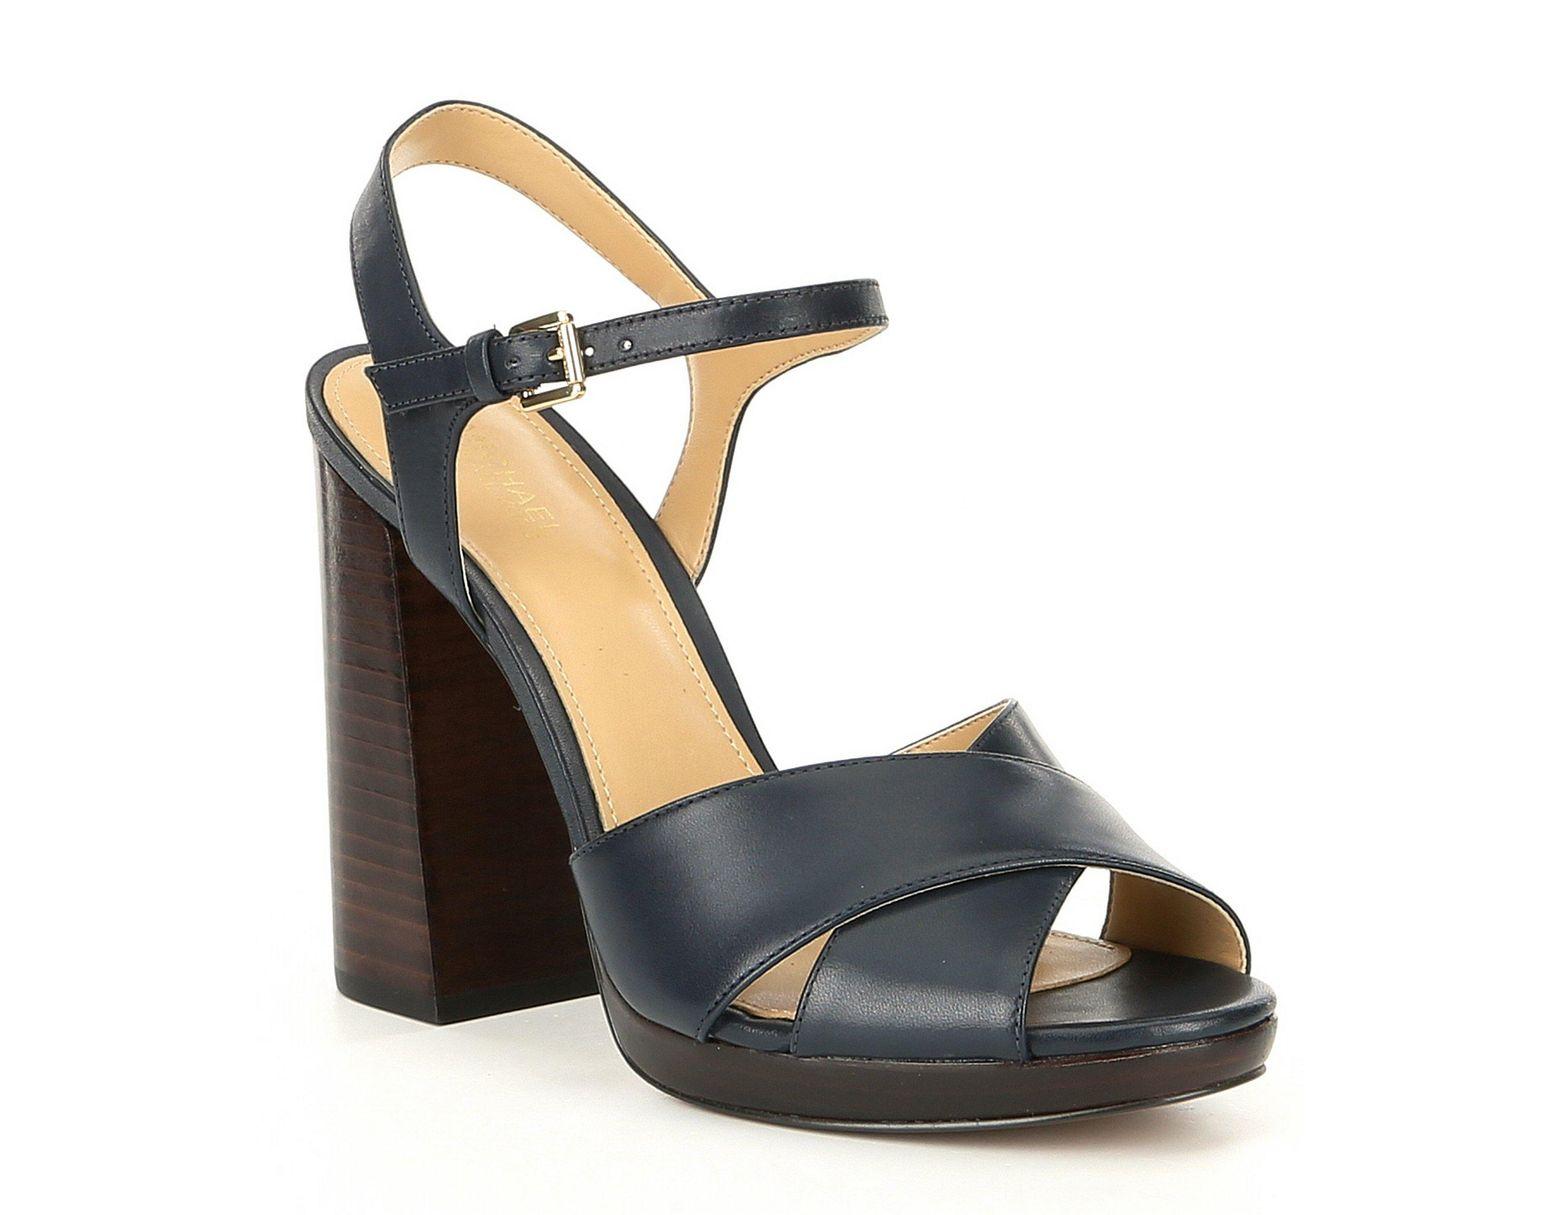 d4c7c5466a MICHAEL Michael Kors Alexia Platform Block Heel Sandals in Blue - Lyst